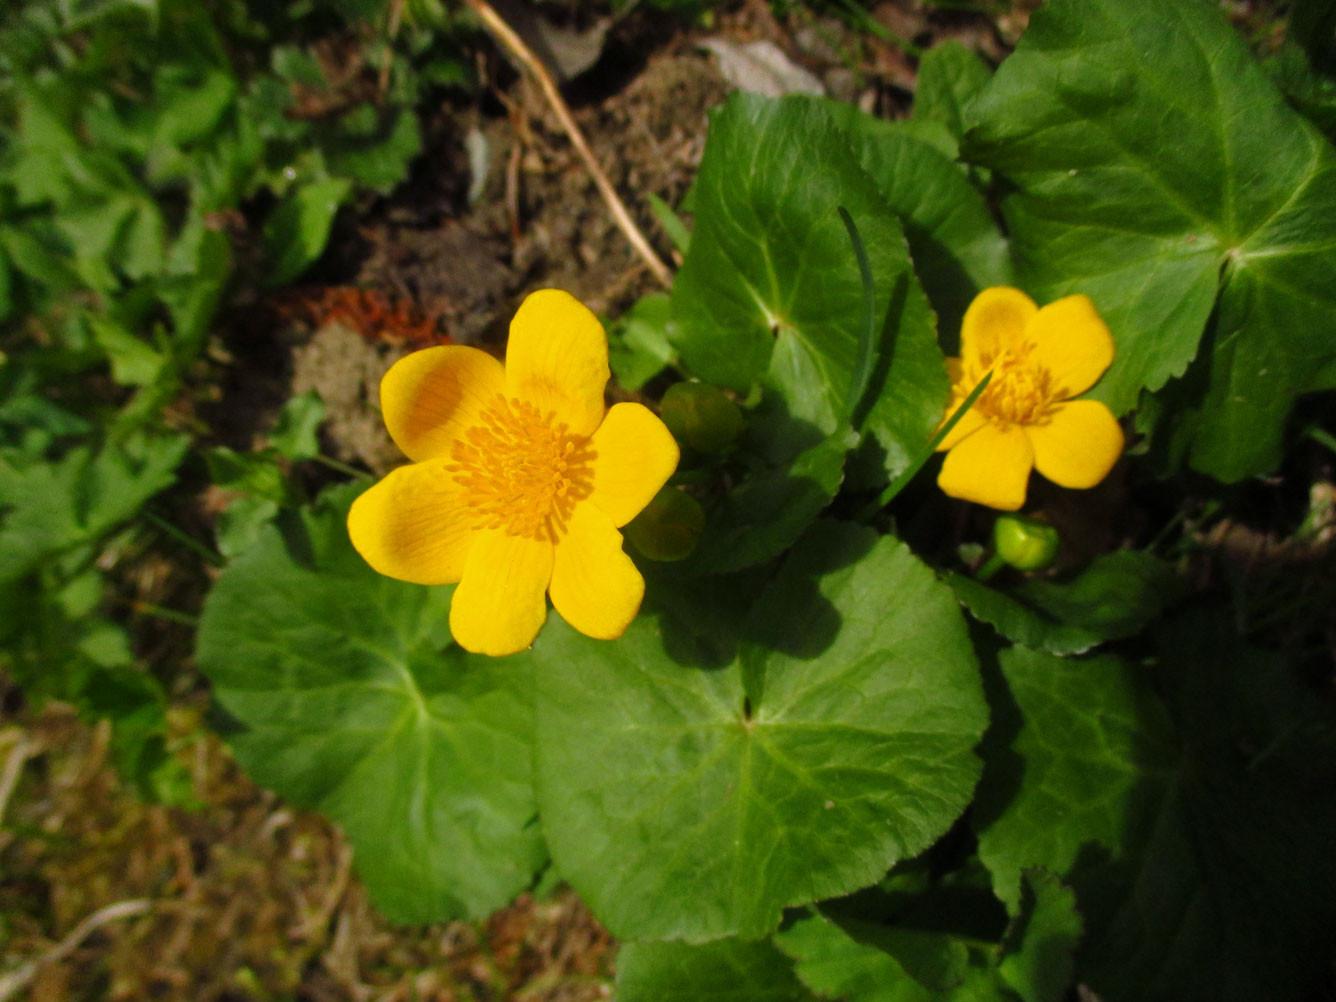 Sumpfdotterblume (Caltha palustris) | Familie: Hahnenfußgewächse (Ranunculaceae)